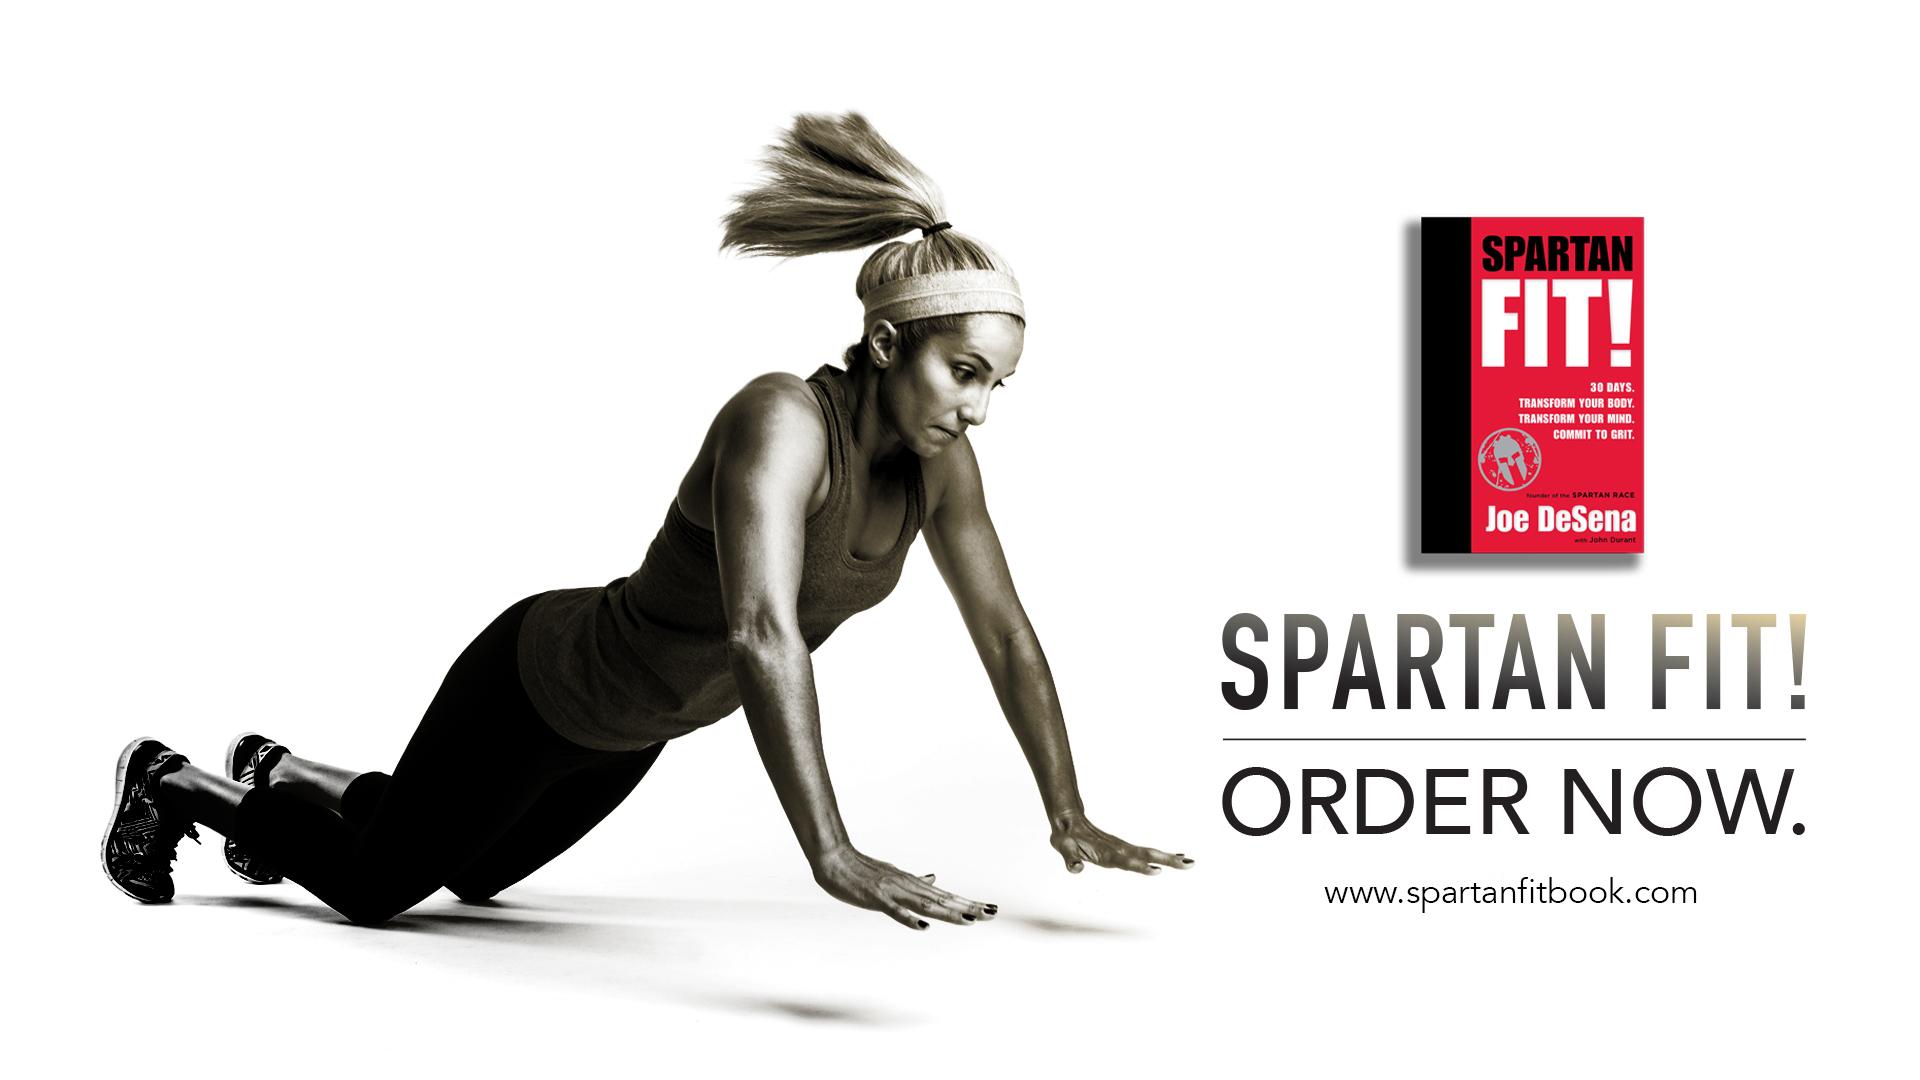 SpartanFit_1920x1080_OrderNow